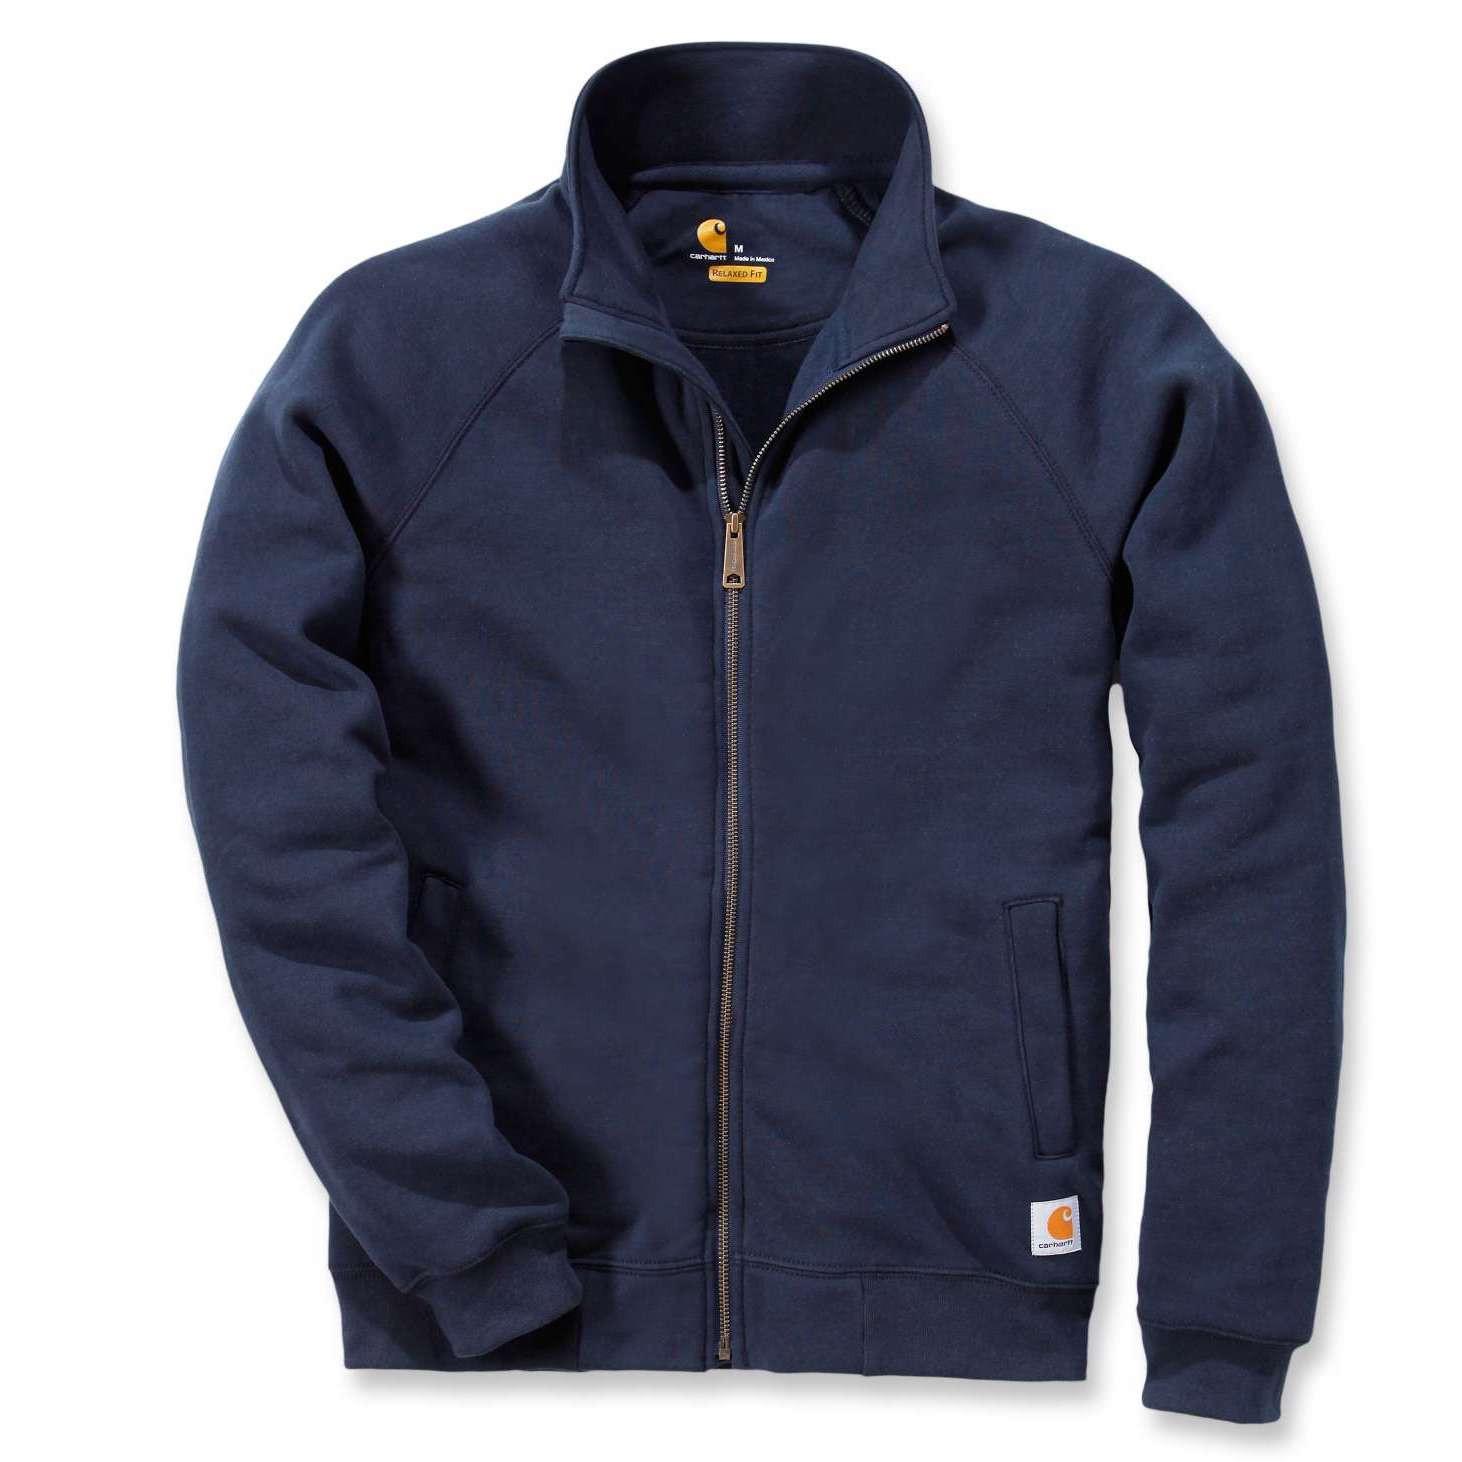 Свитшот на молнии Carhartt Midweight Mock Neck Zip Sweatshirt - K350 (New Navy, XS)